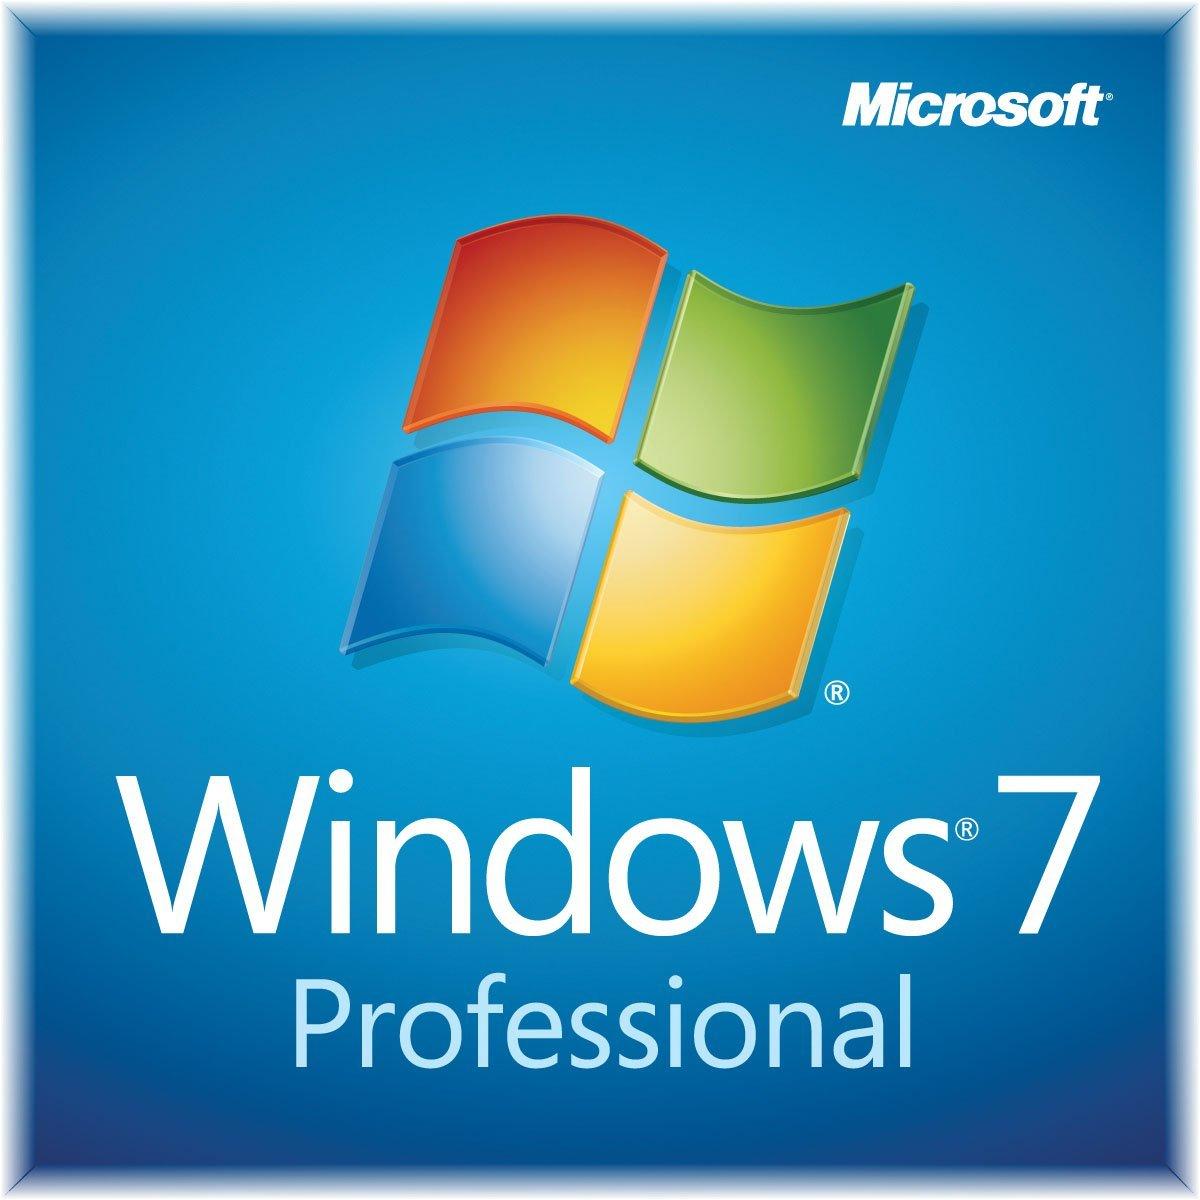 Windows 7 Professional Product Key 32/64 Bit